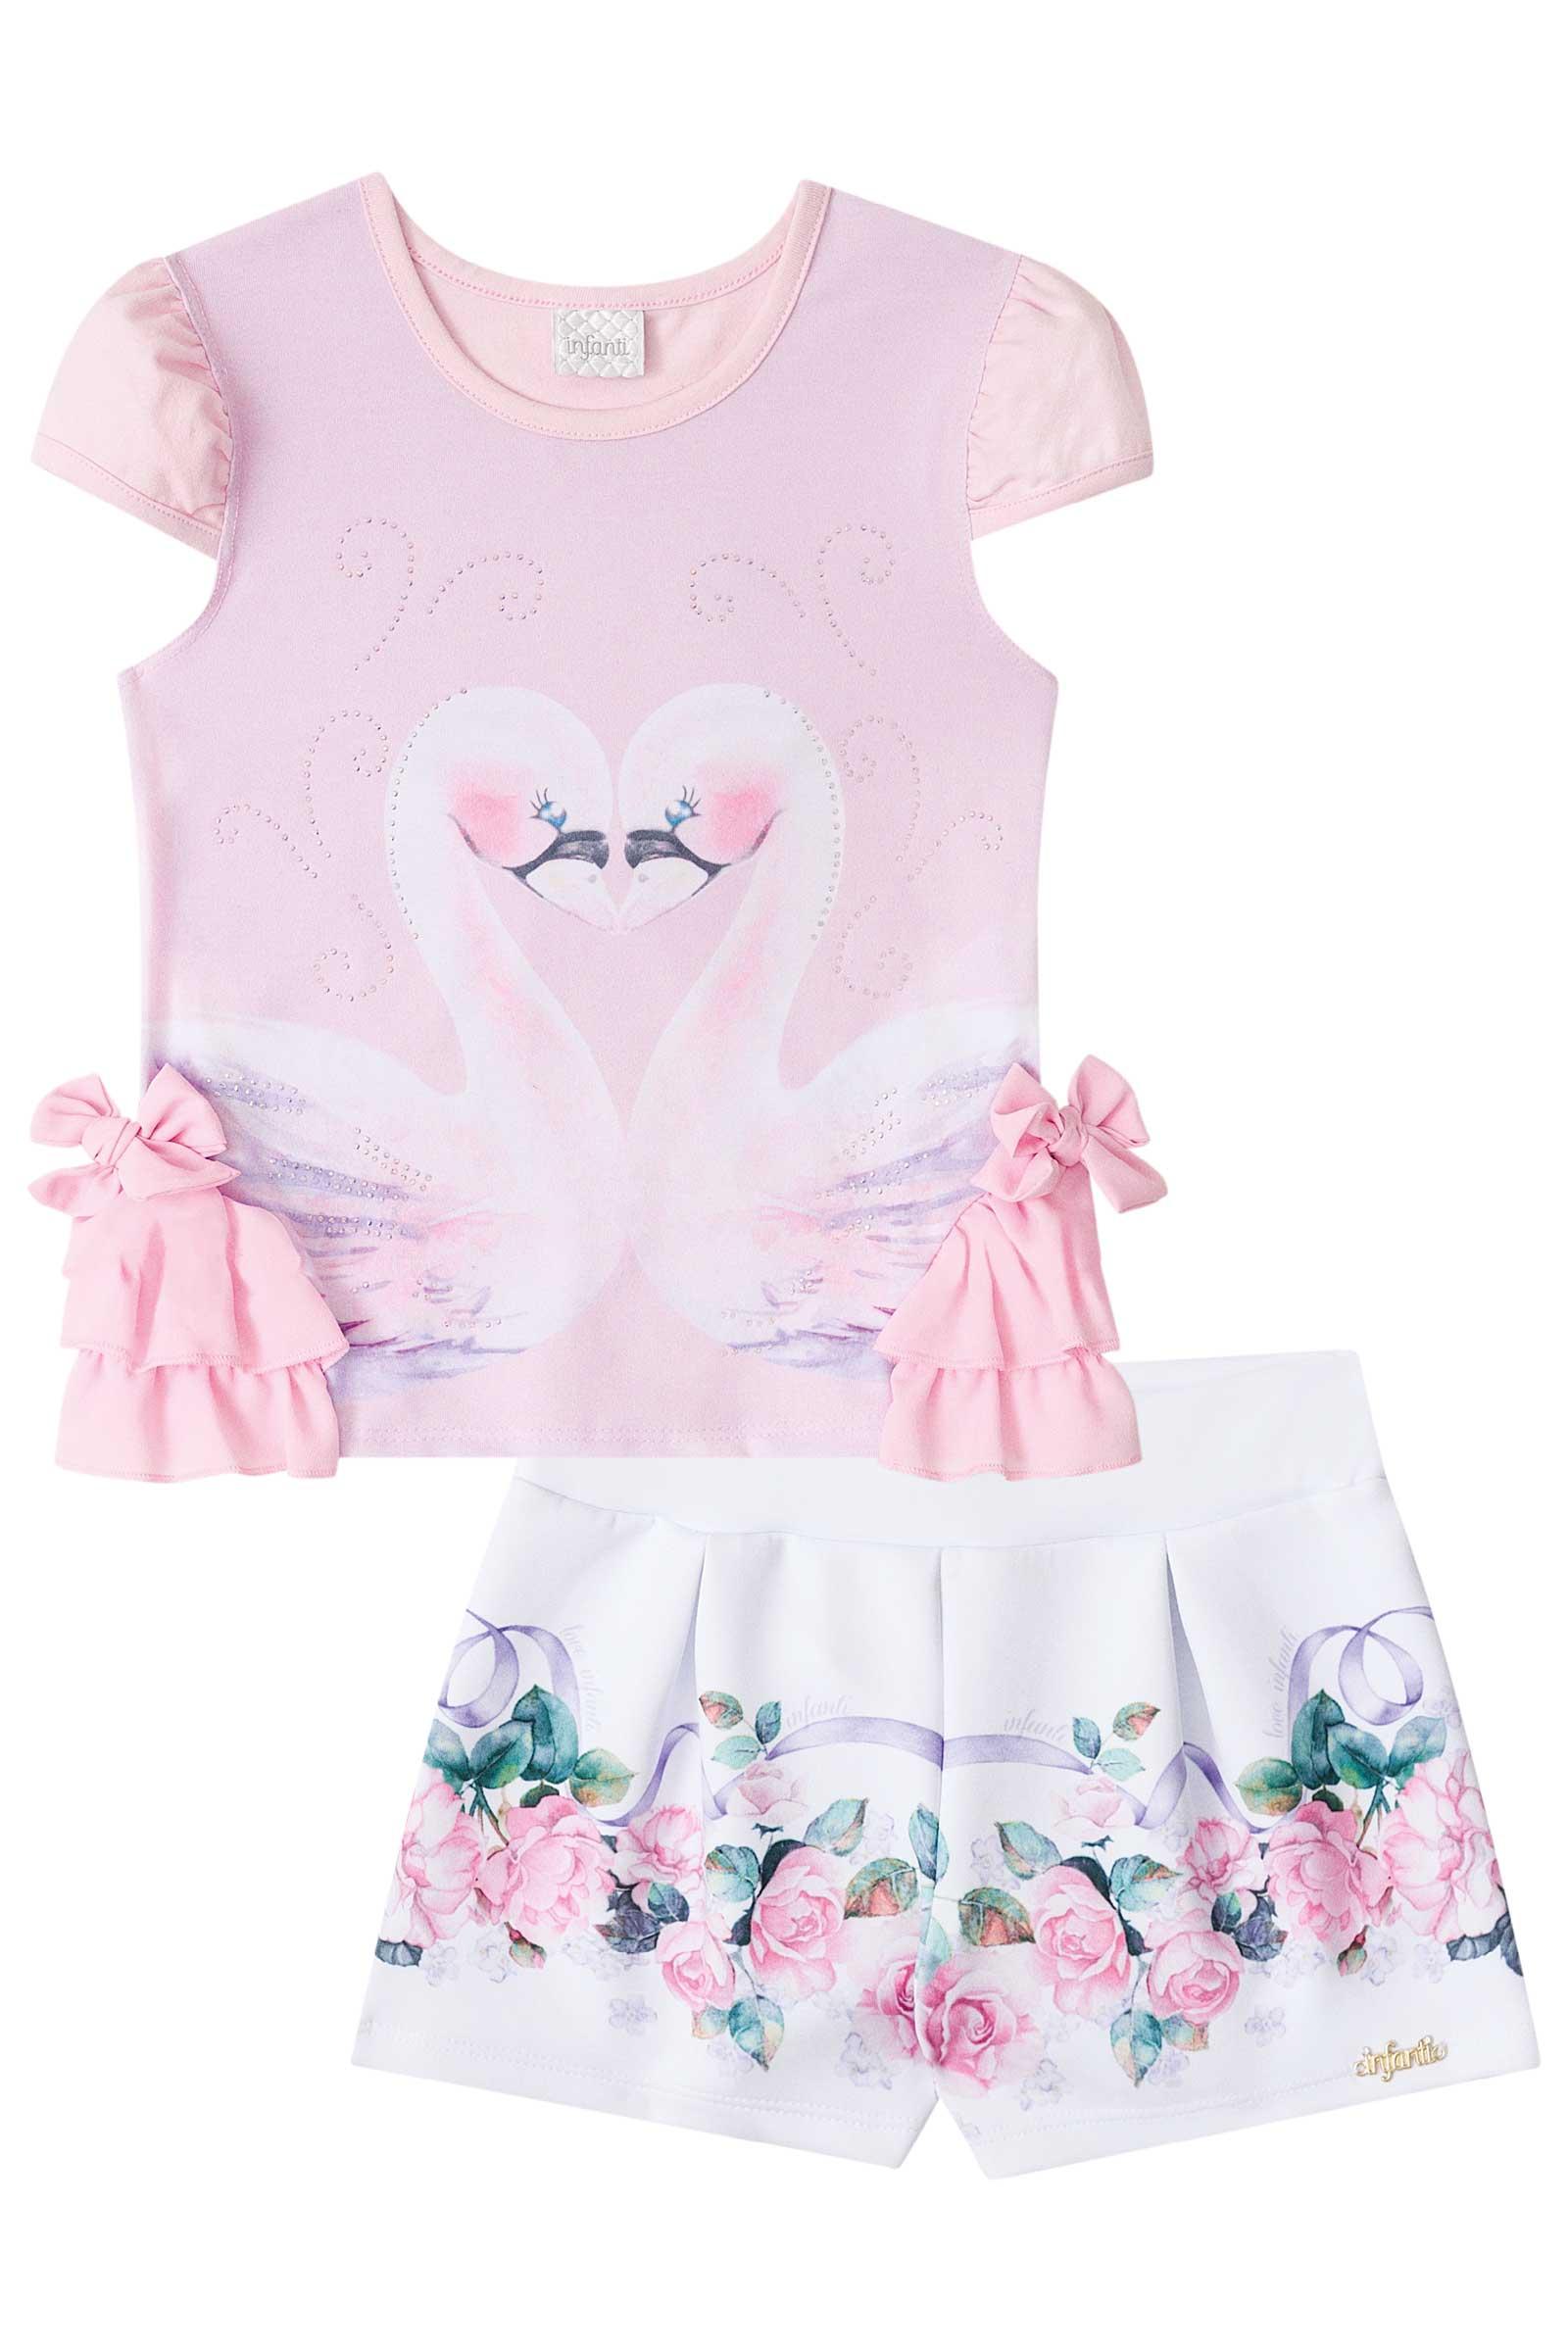 fab6d00b0 Conjunto Infantil Feminino Infanti Estampa Cisnes Rosa - Pamplemousse